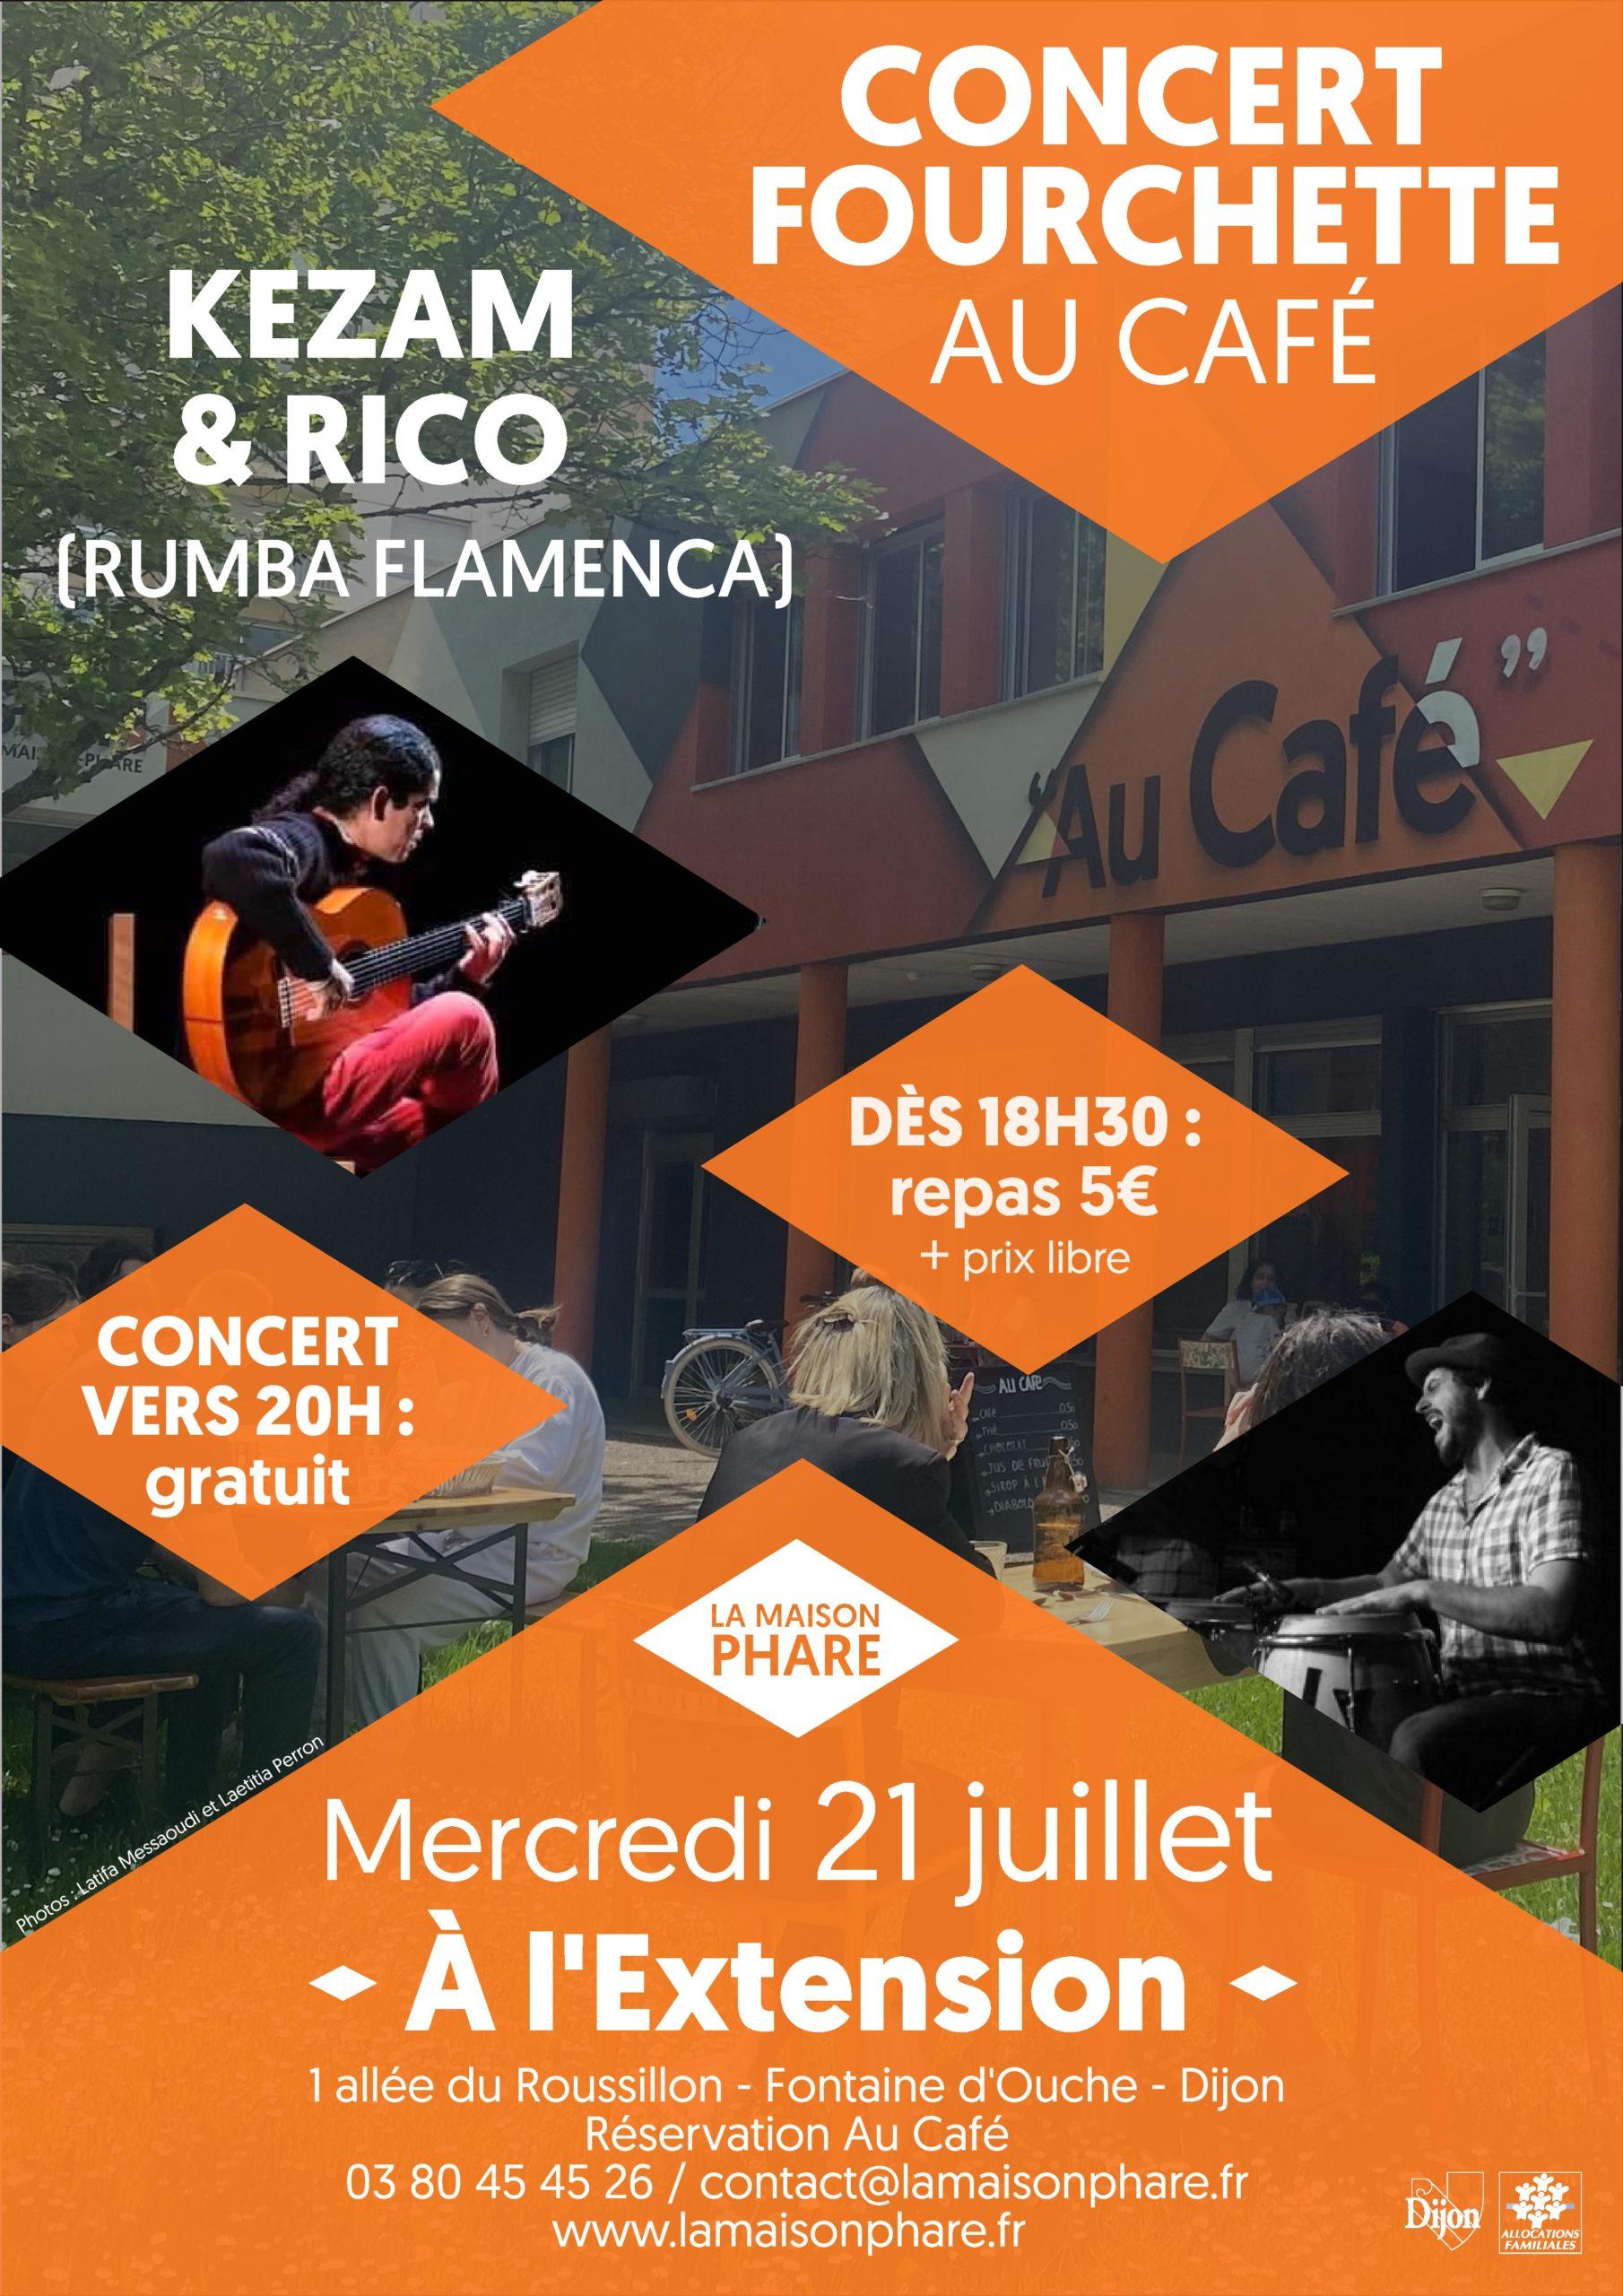 Concert-fourchette : Rico Mambo et Kezam